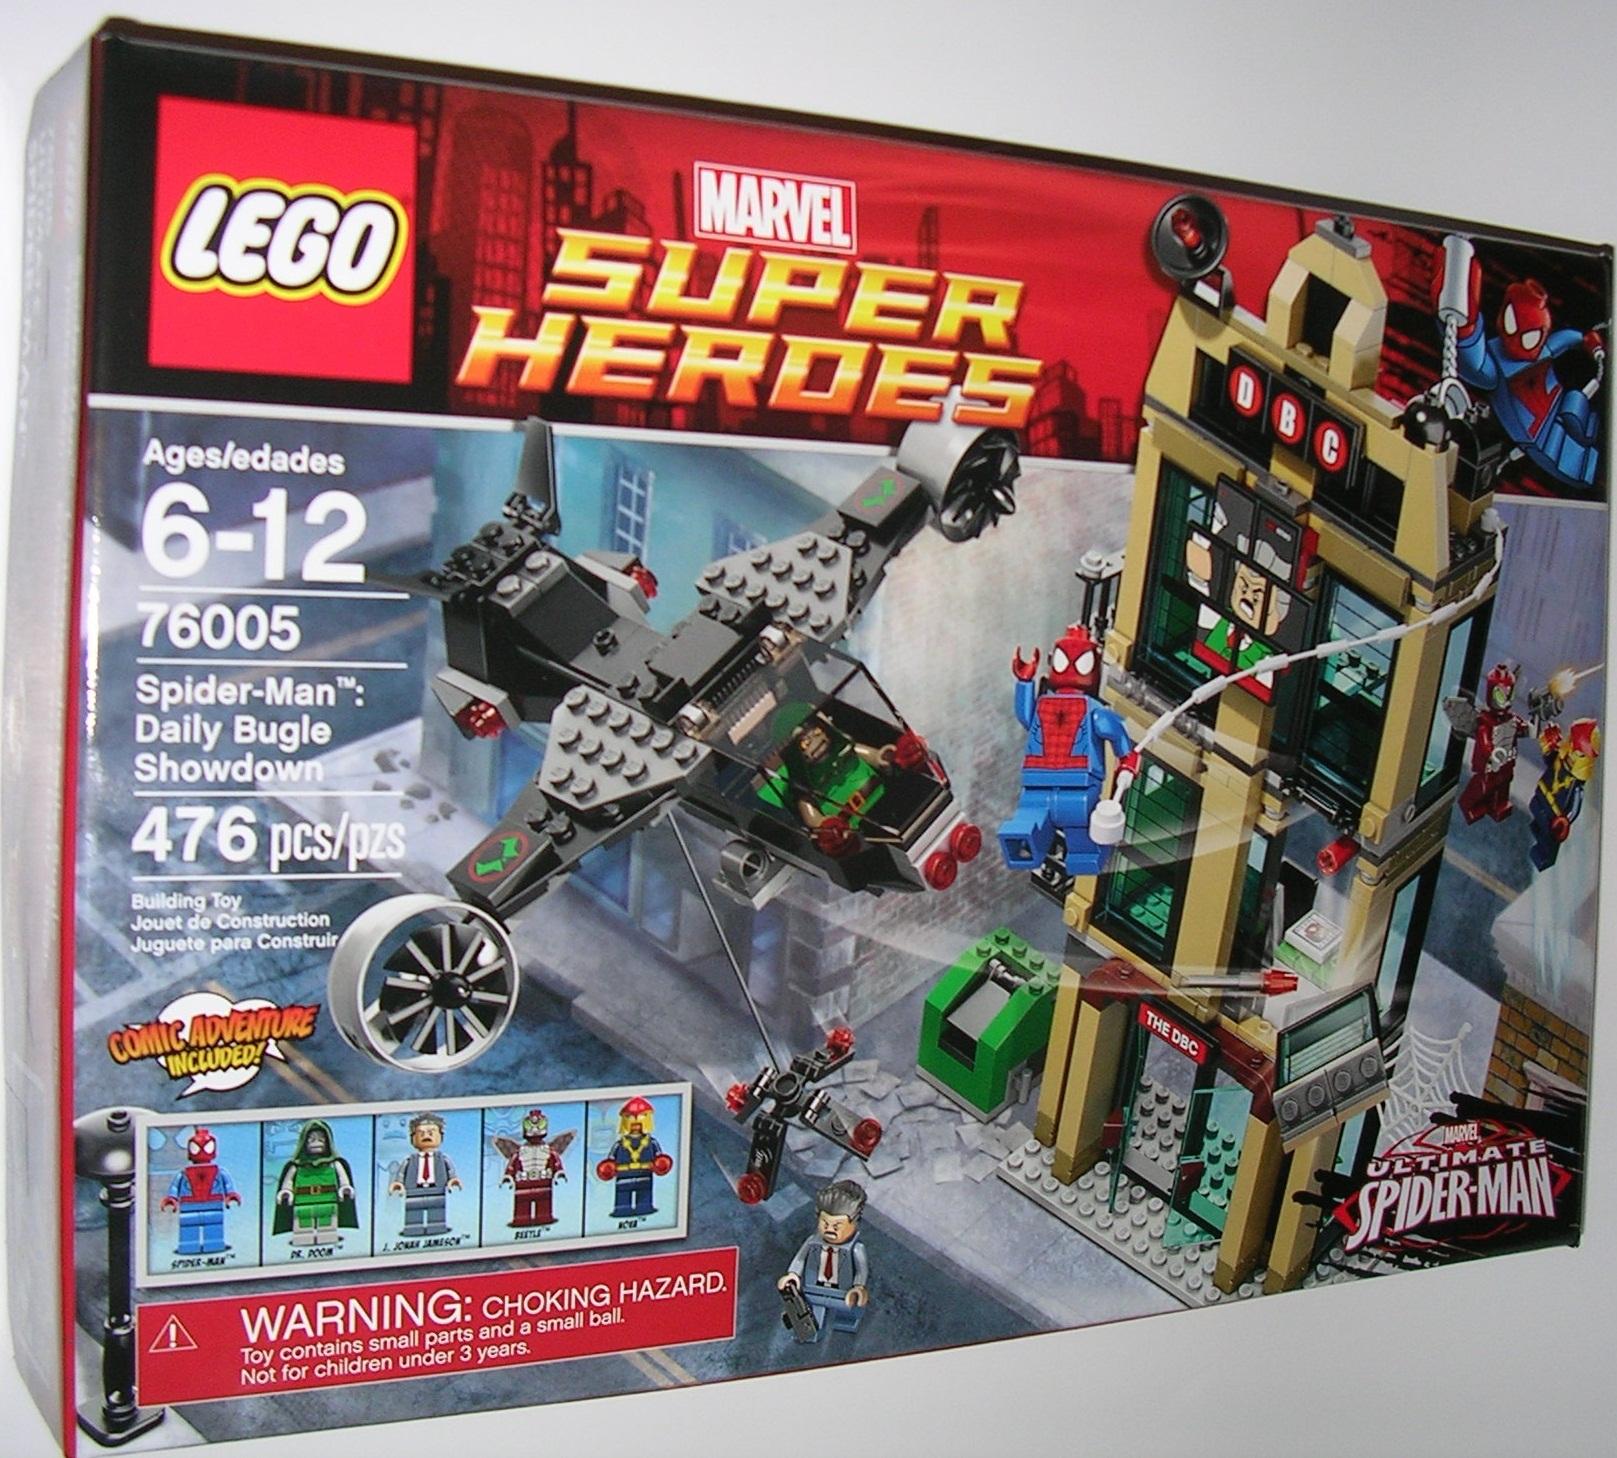 Top 10 LEGO Marvel Super Heroes Sets! - YouTube |Lego Marvel Superheroes Deadpool Set